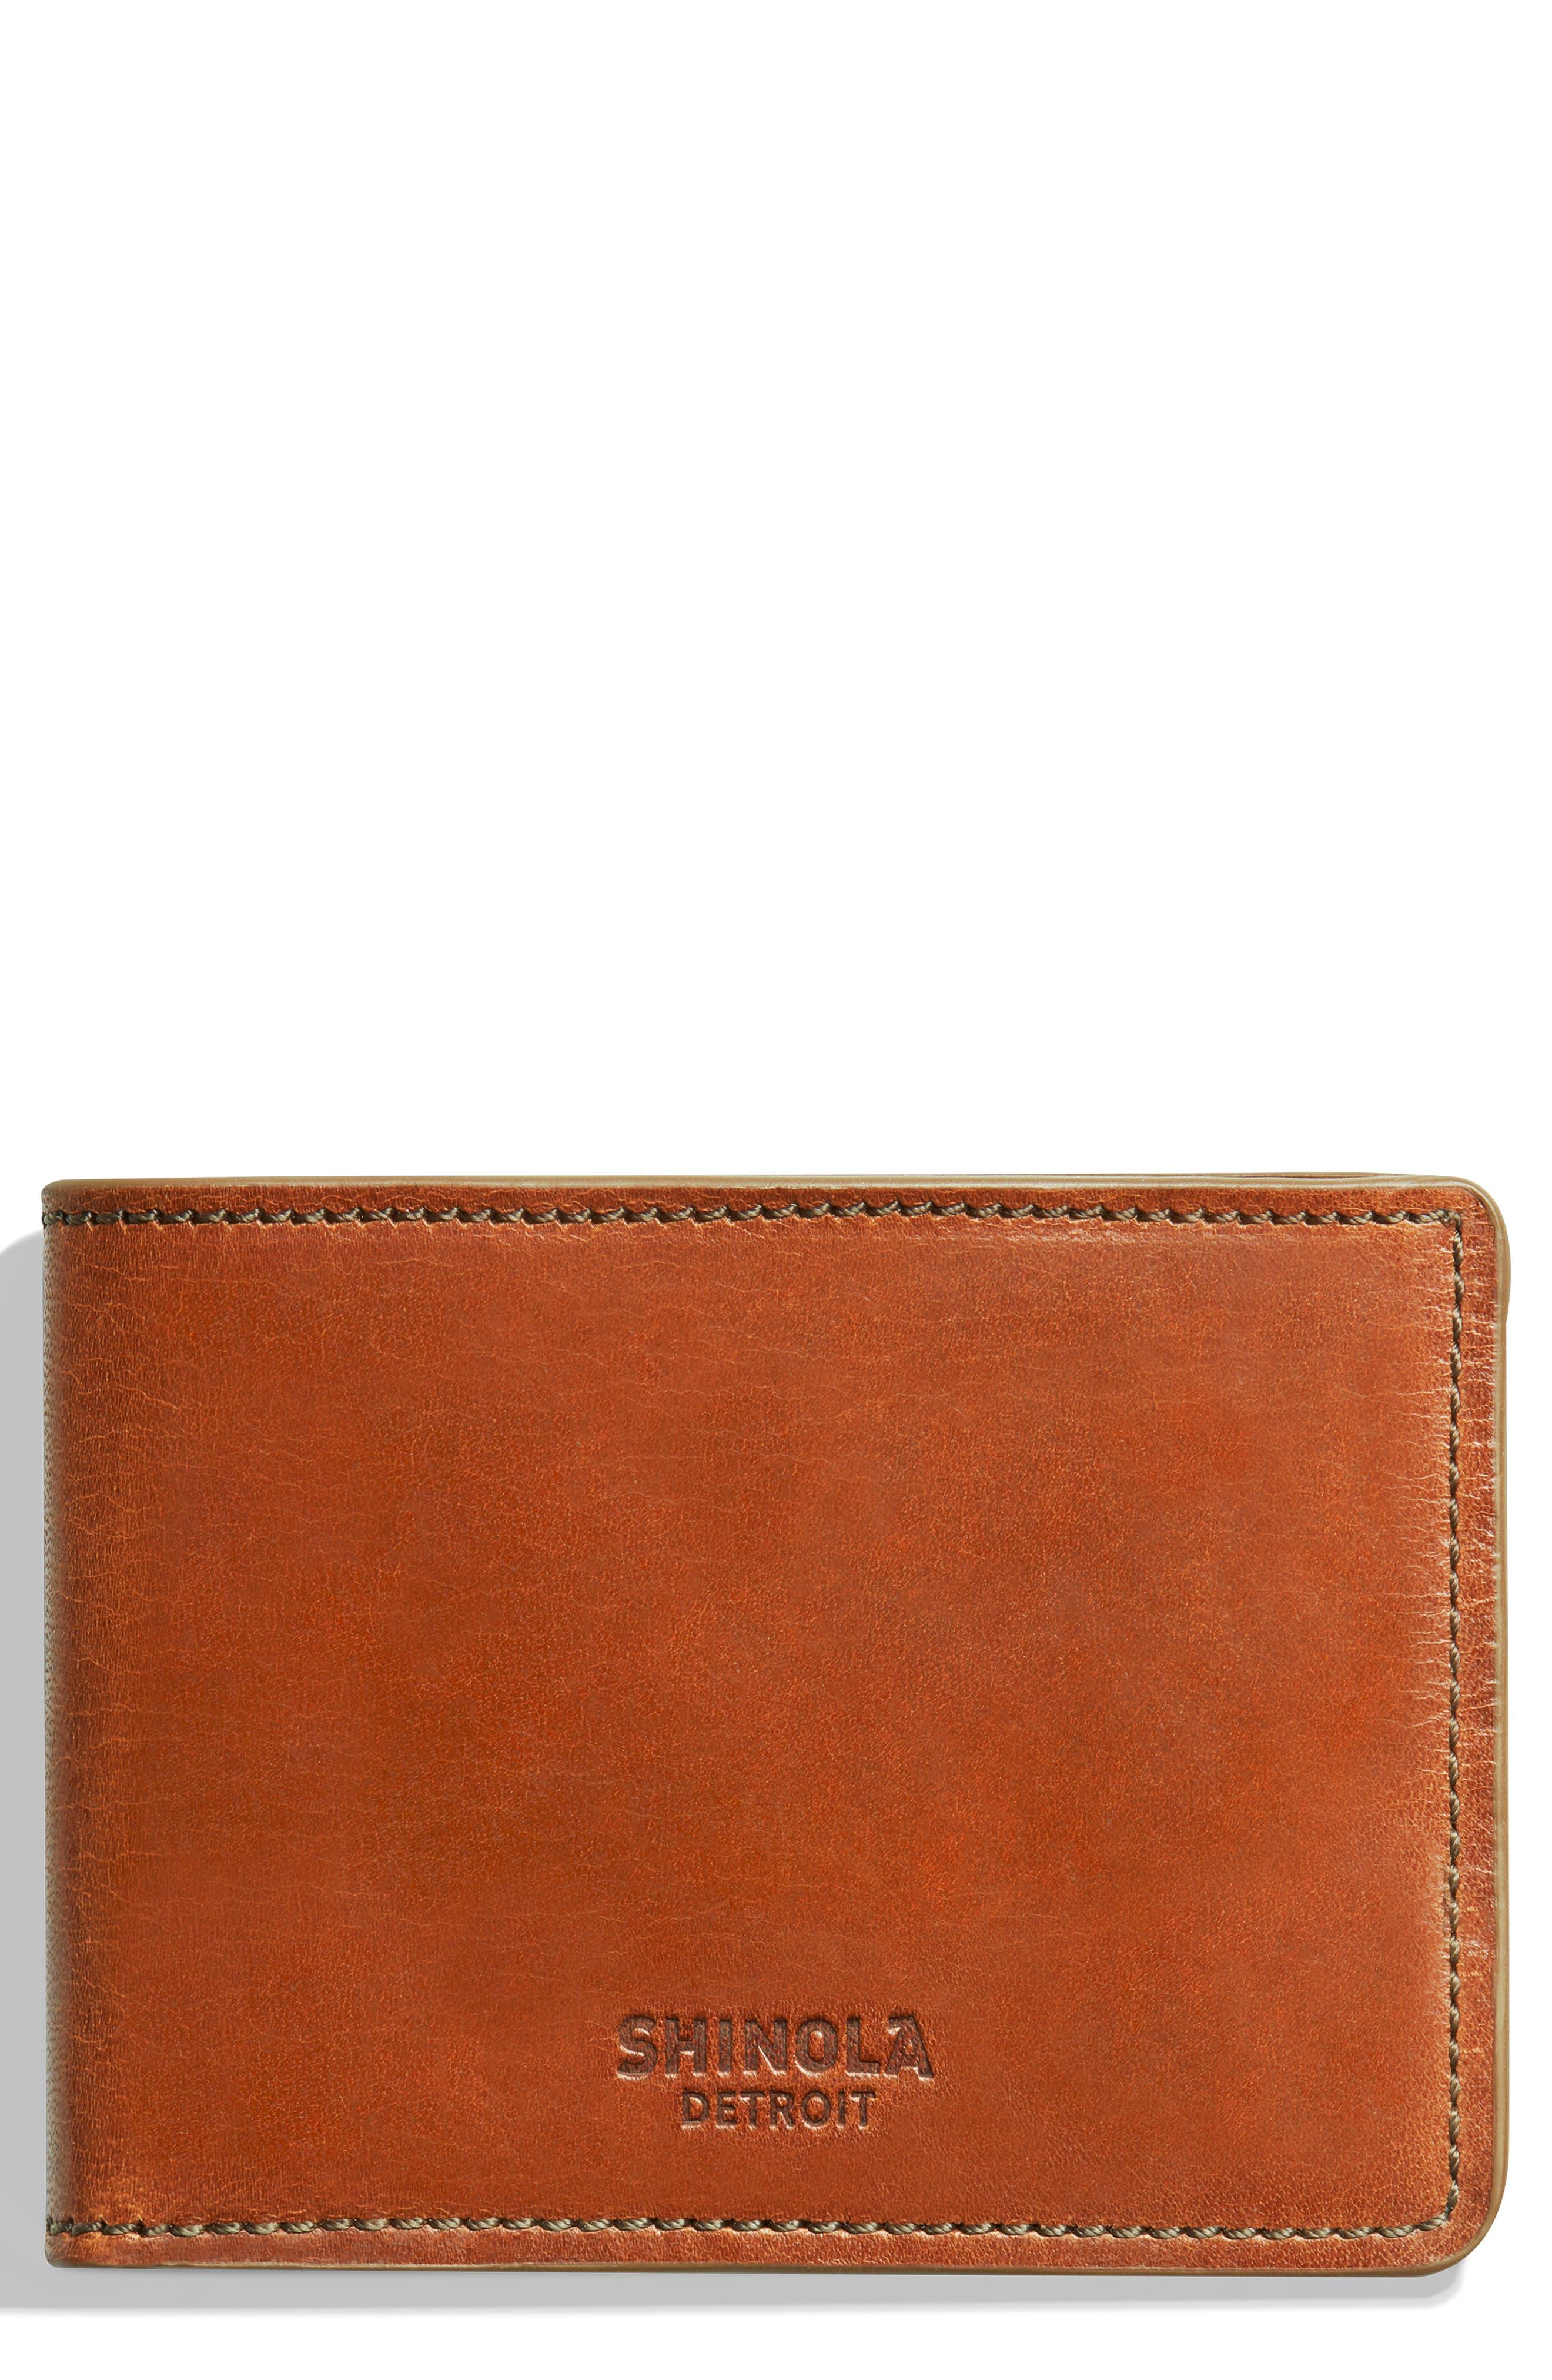 SHINOLA, Harness Slim 2.0 Bifold Leather Wallet, Main thumbnail 1, color, BOURBON